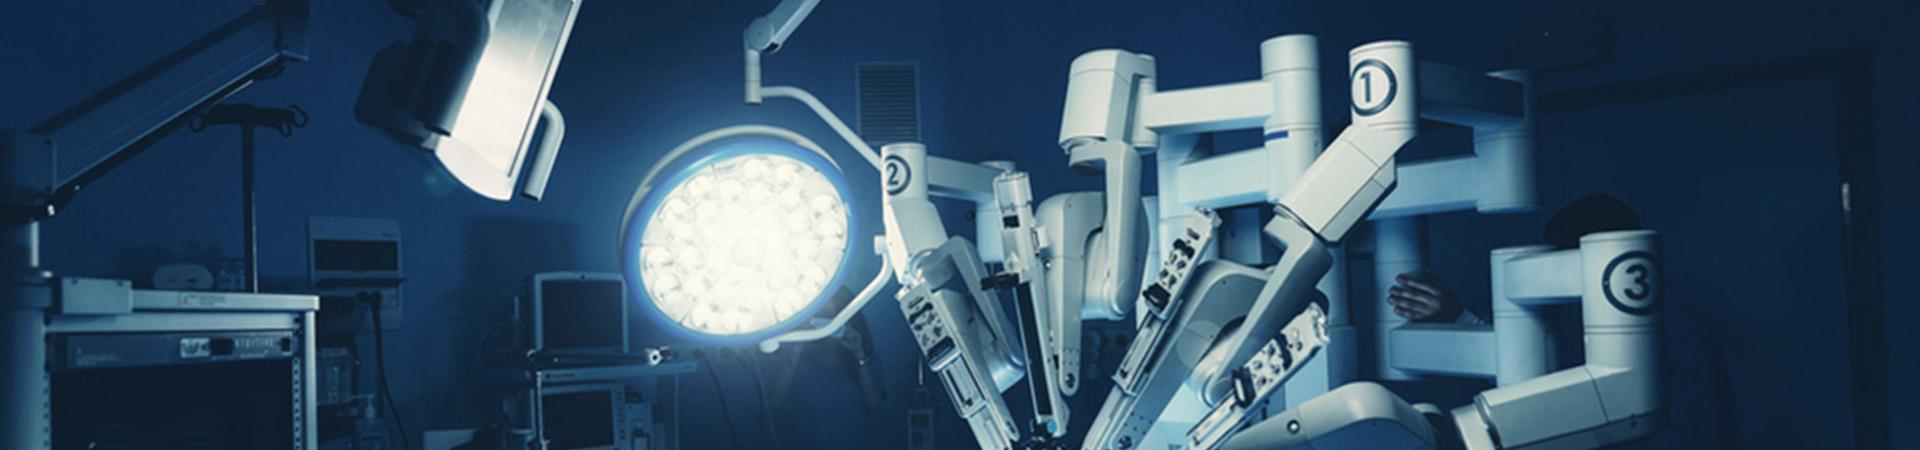 Cirurgia robótica